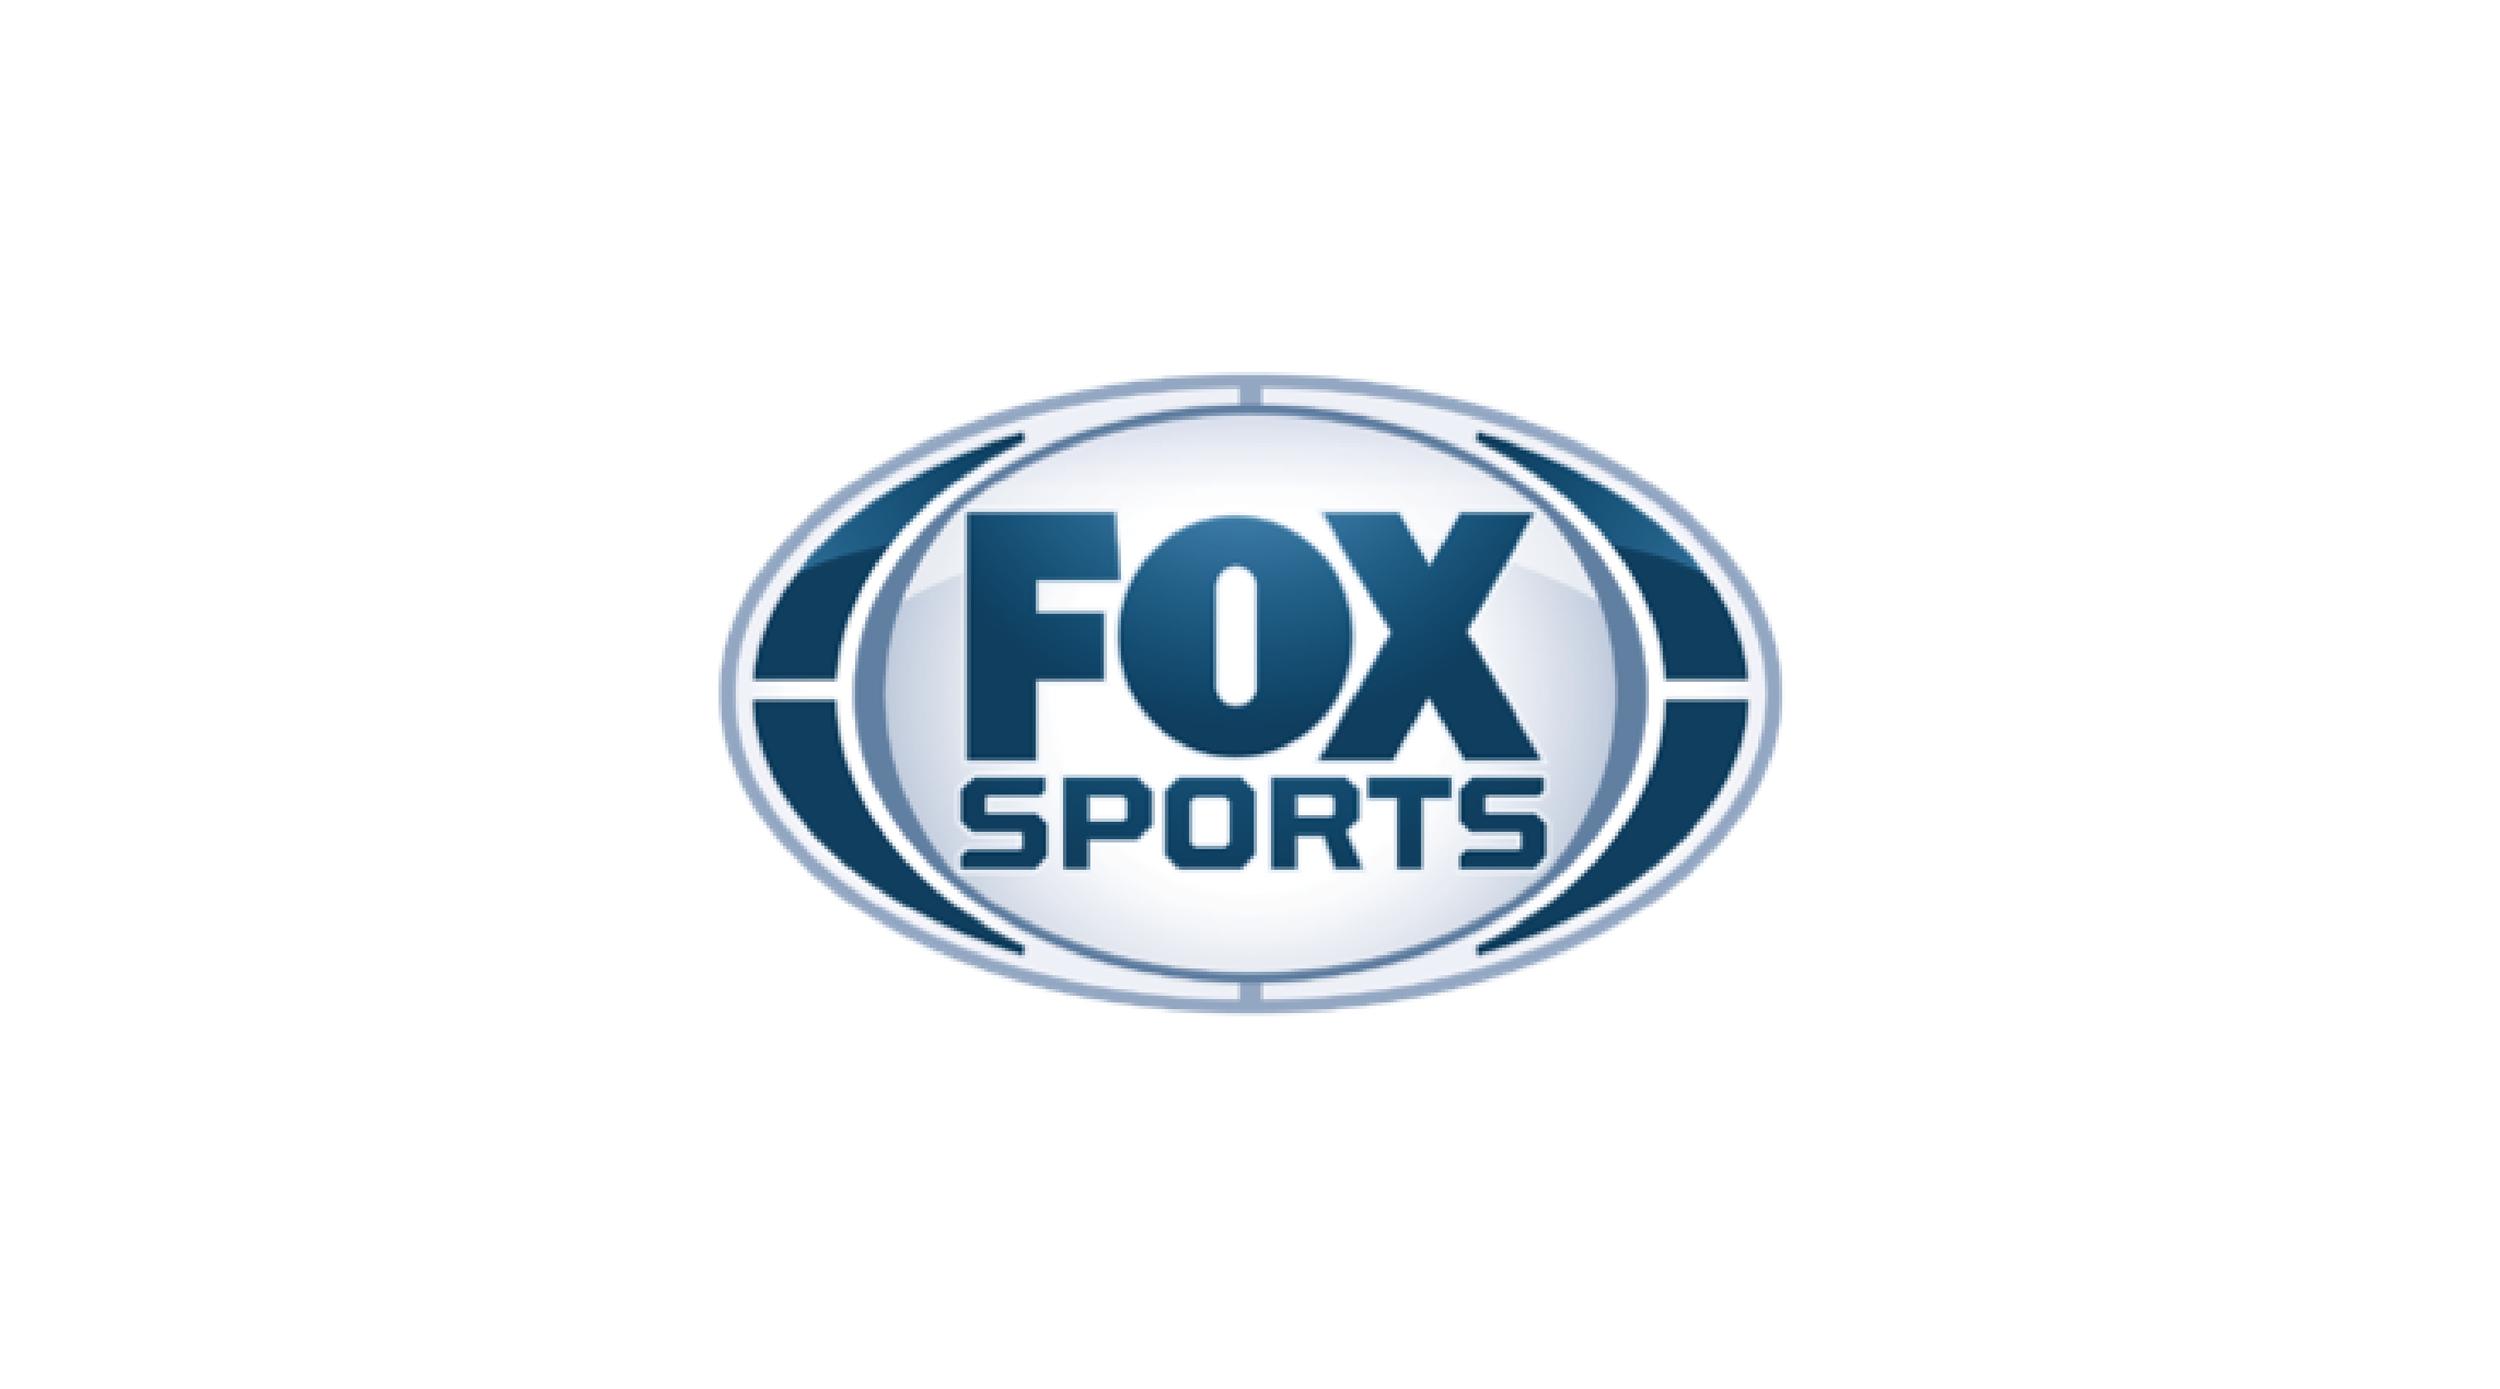 logo_fox-sports.png